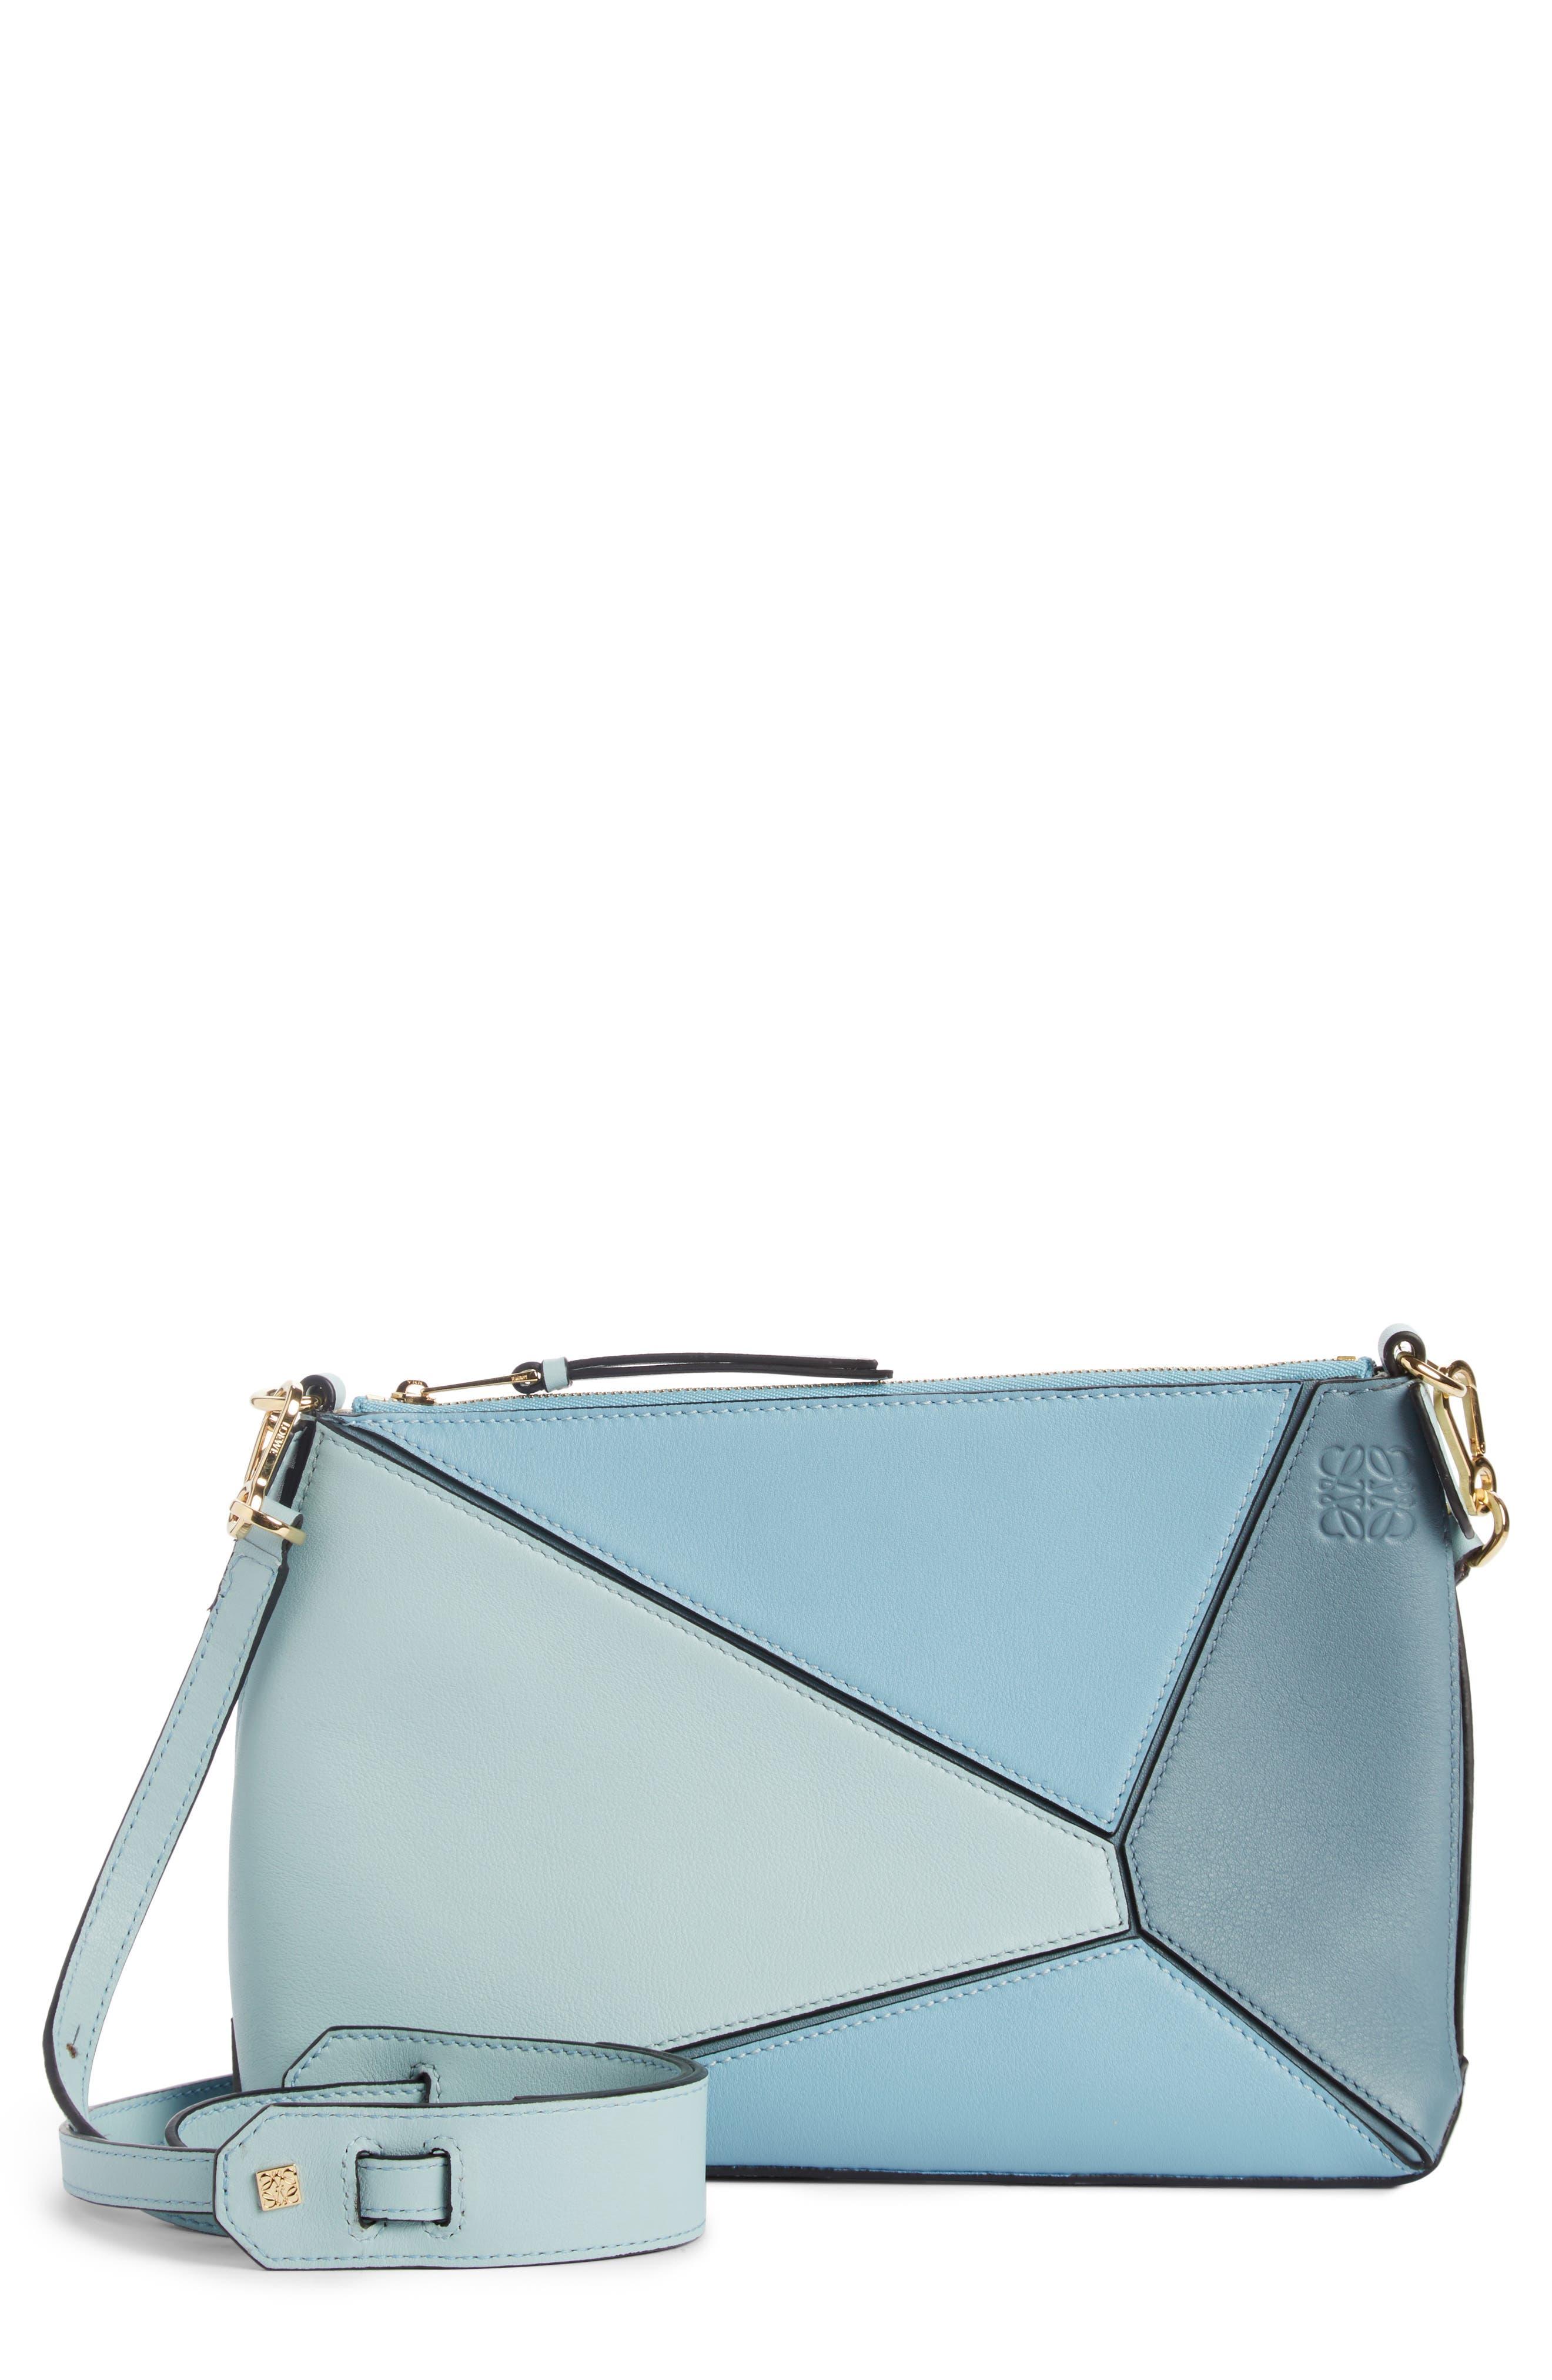 Mini Puzzle Calfskin Leather Crossbody Bag,                             Main thumbnail 1, color,                             Stone Blue Multitone